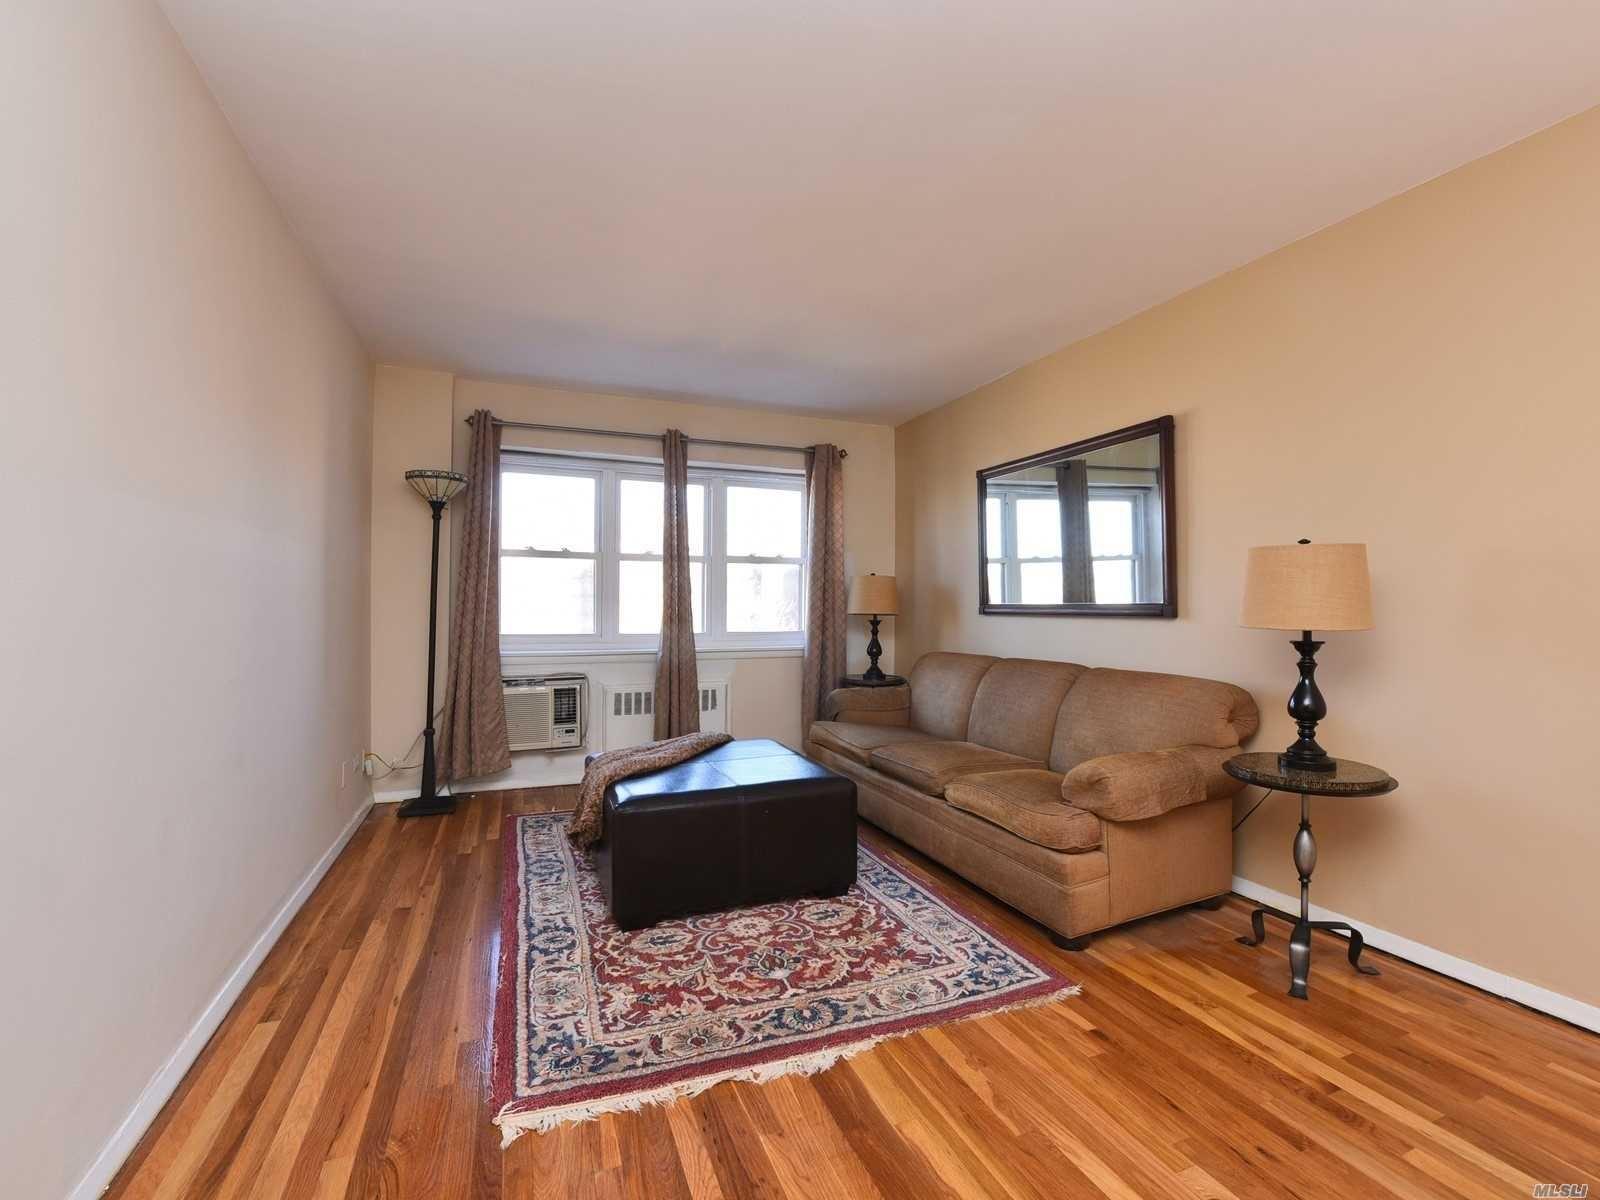 144-55 Melbourne Avenue #5J, Flushing, NY 11367 - MLS#: 3208314